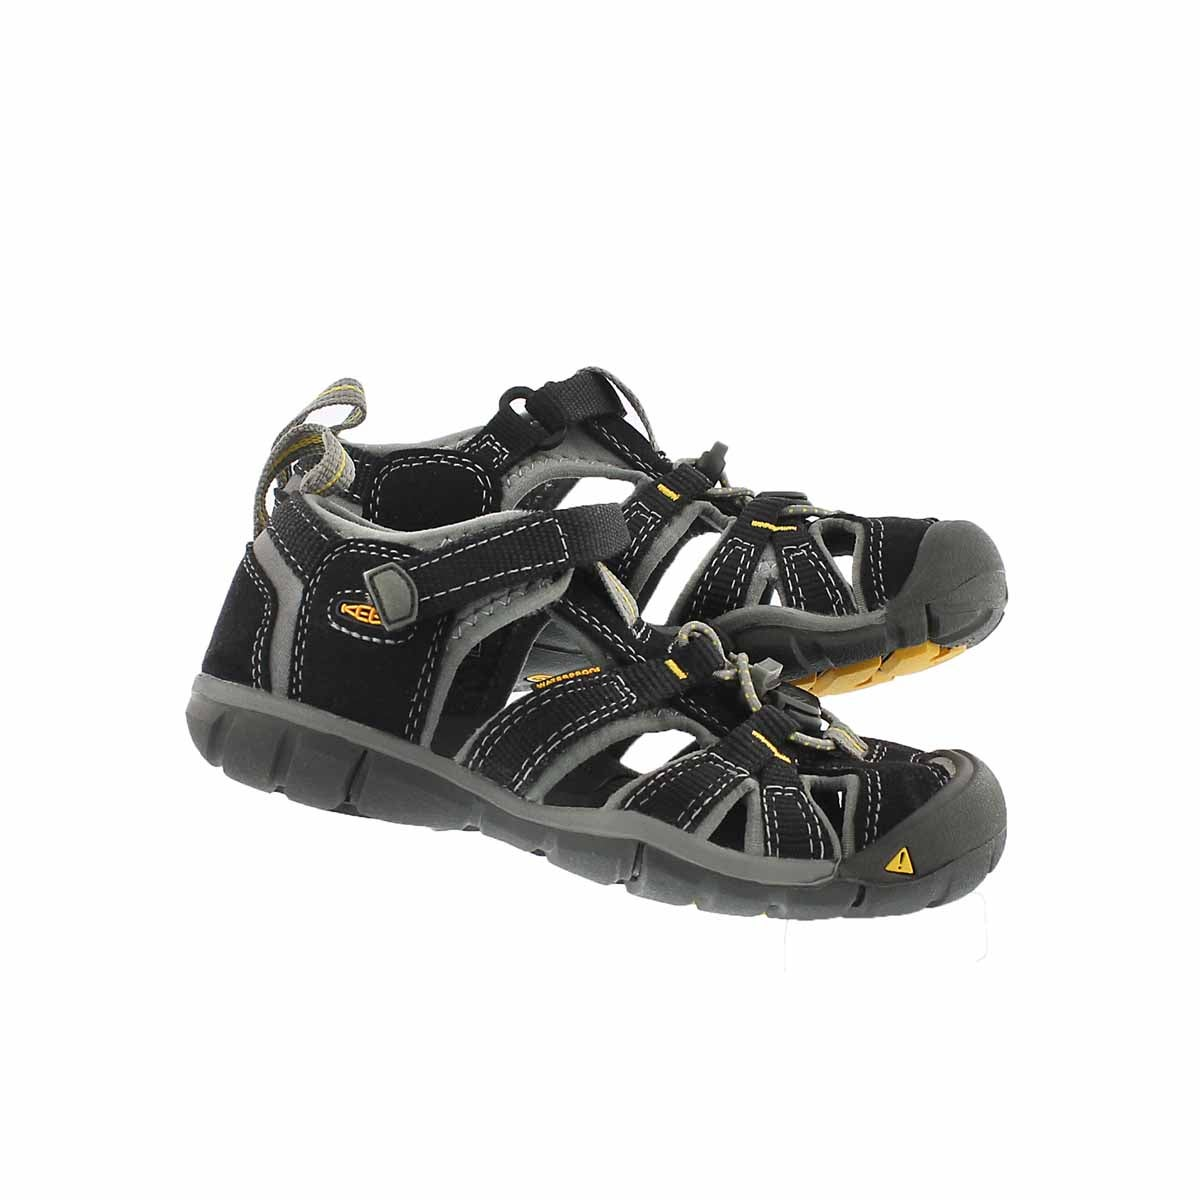 Infs-b Seacamp II black sport sandal